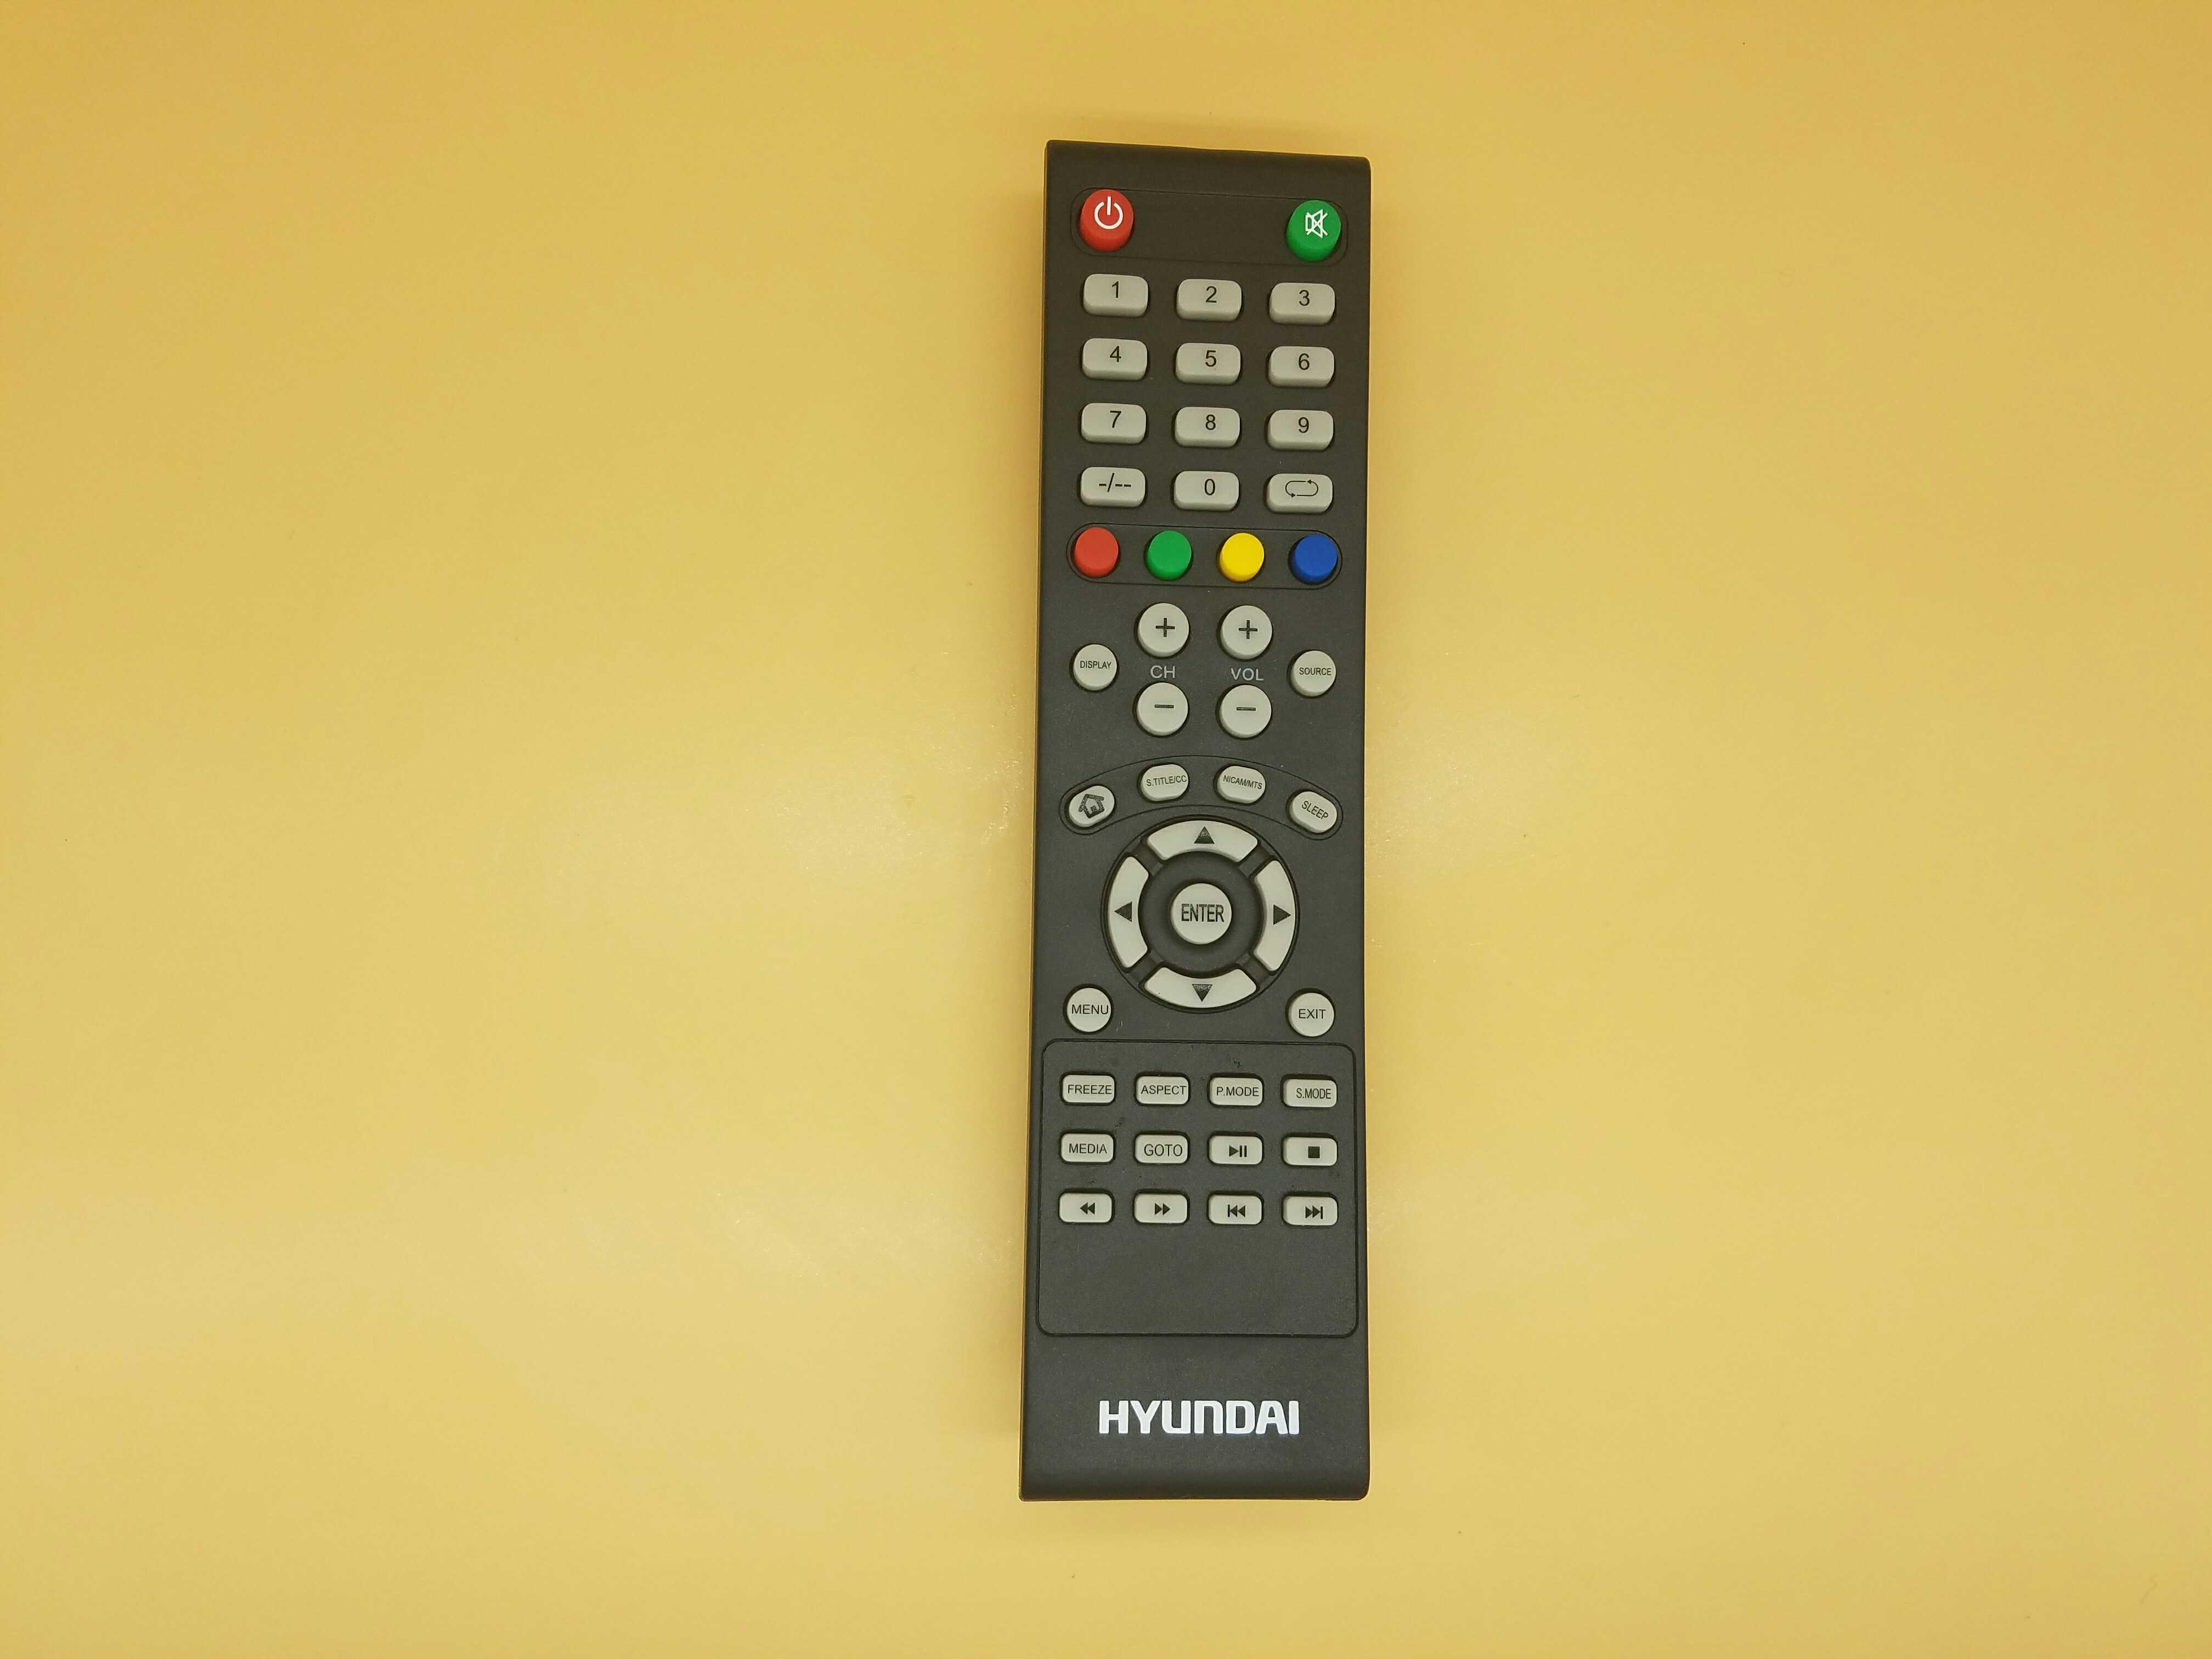 Product Original Factory Origional Product Hyundai HYUNDAI English Export Liquid Crystal TV Remote Control with Shape Universal